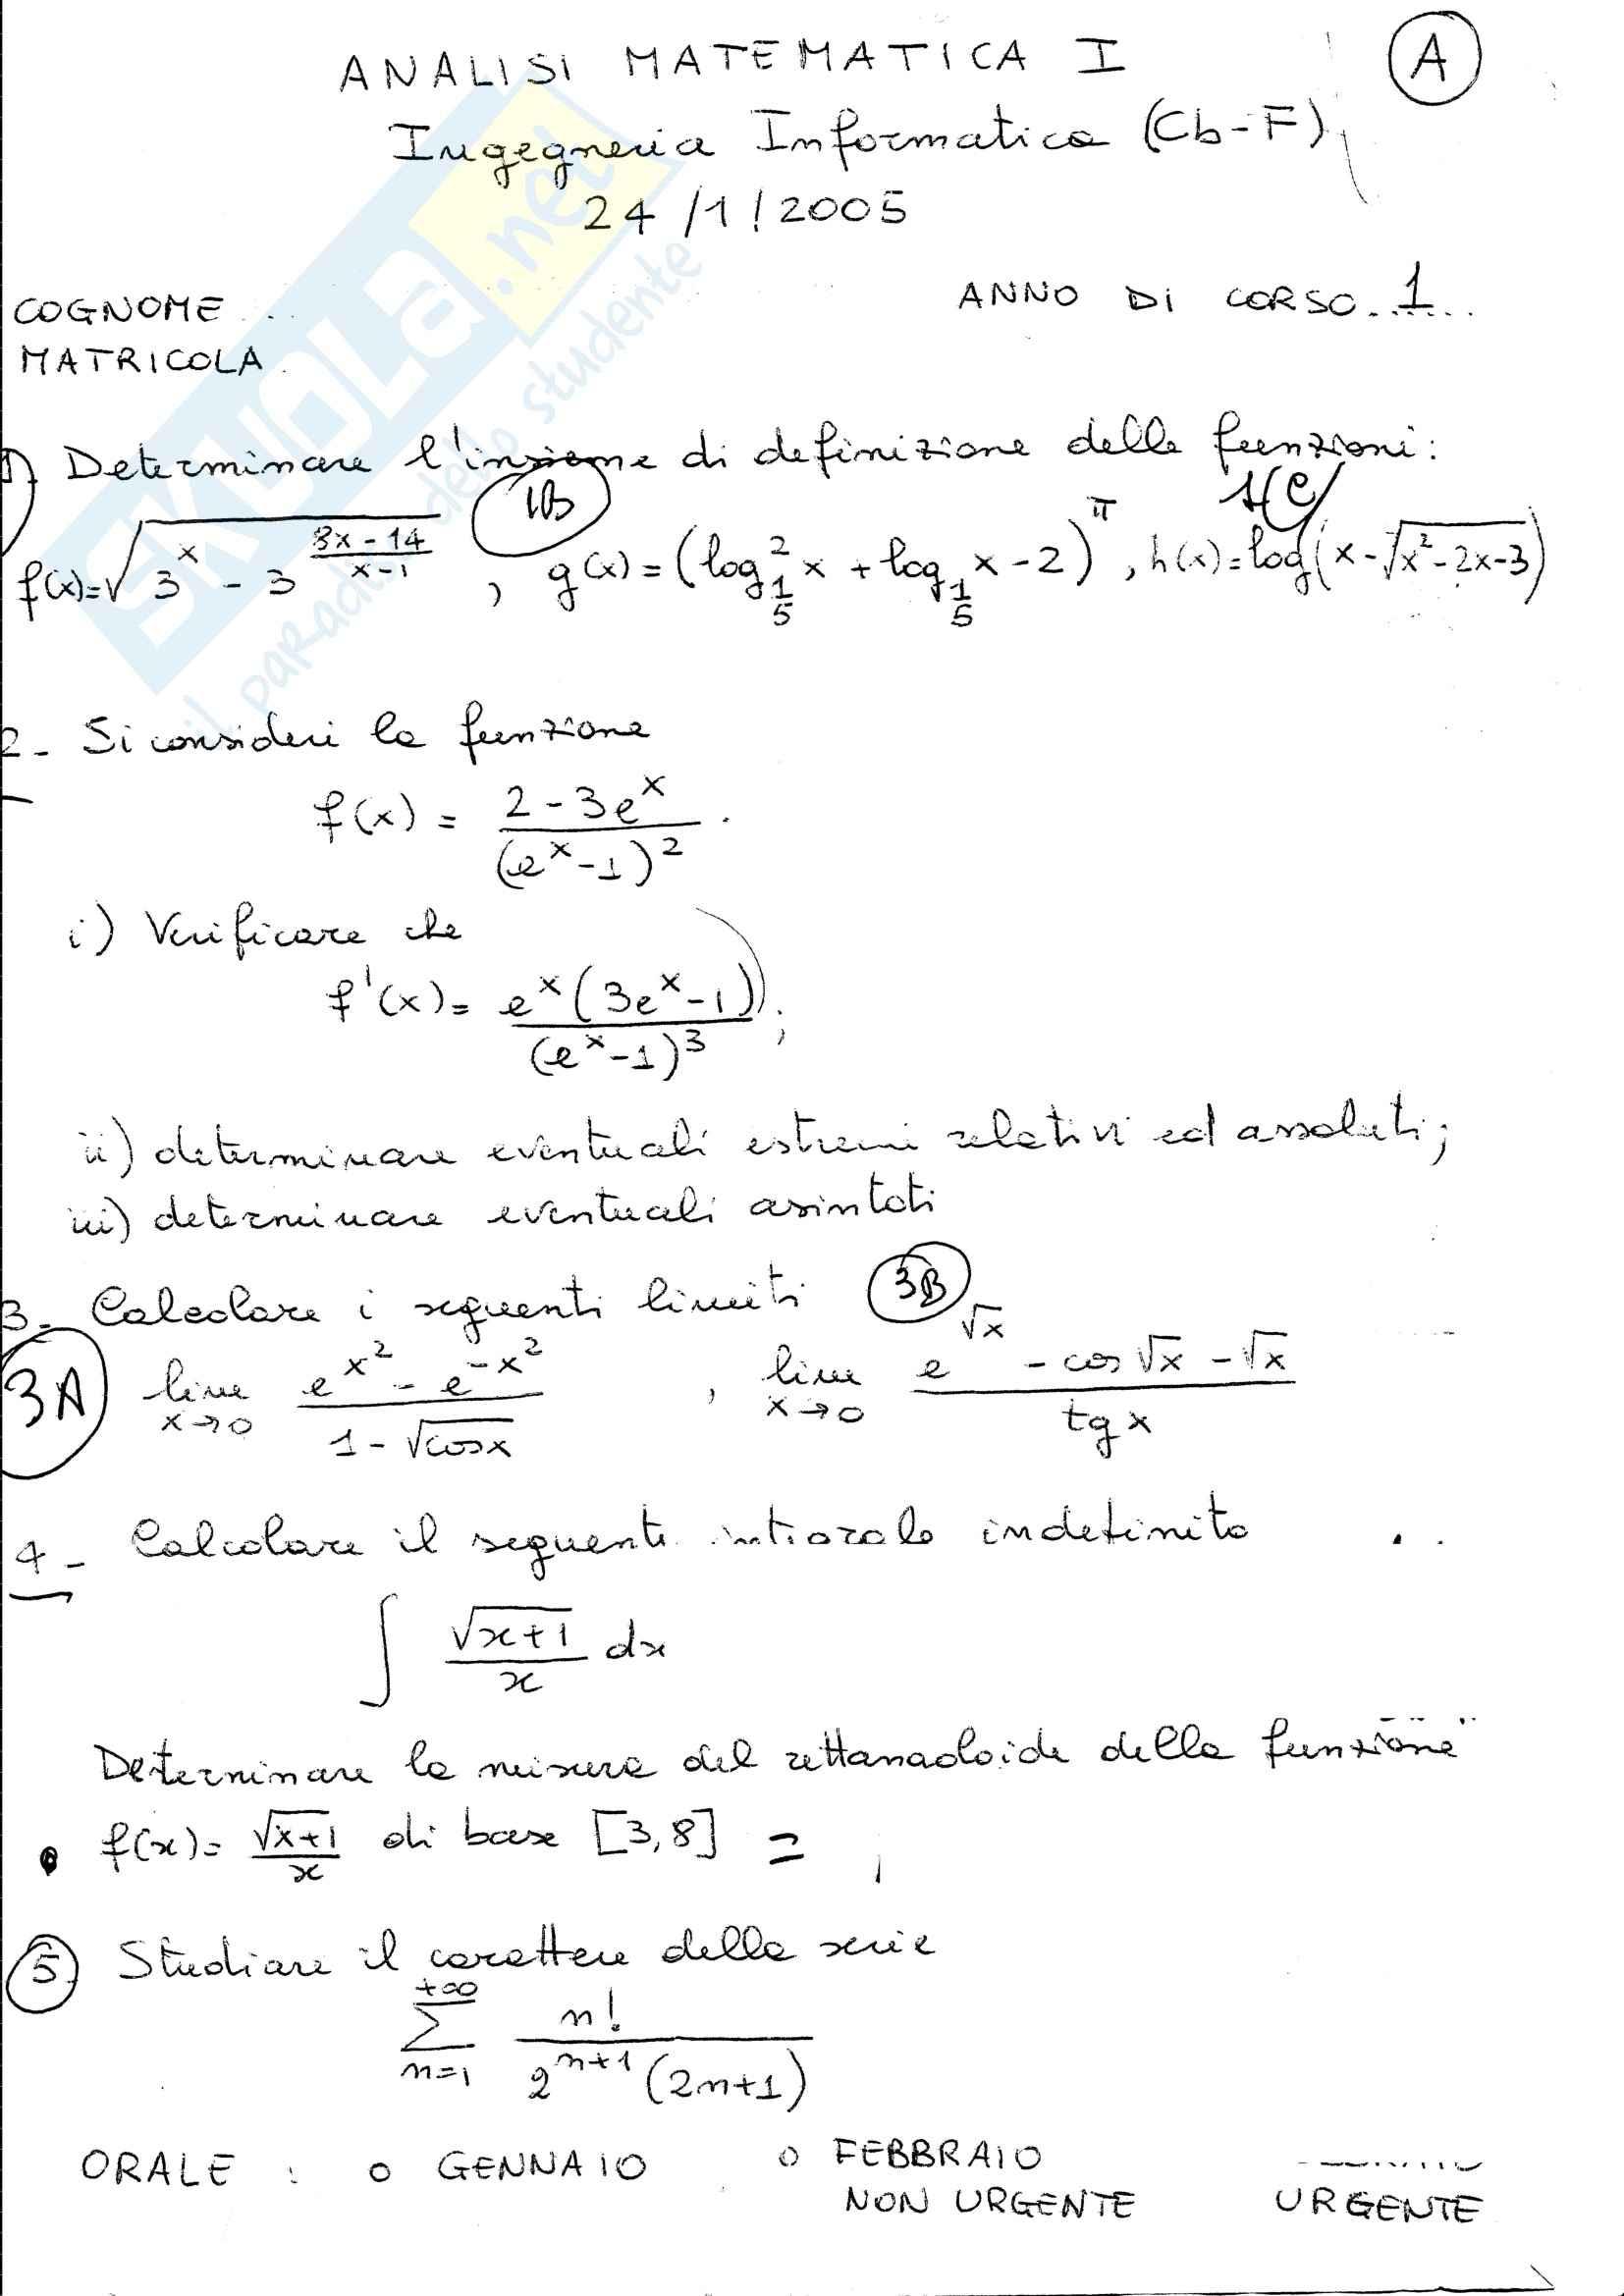 Analisi I - prova d'esame gennaio 2005